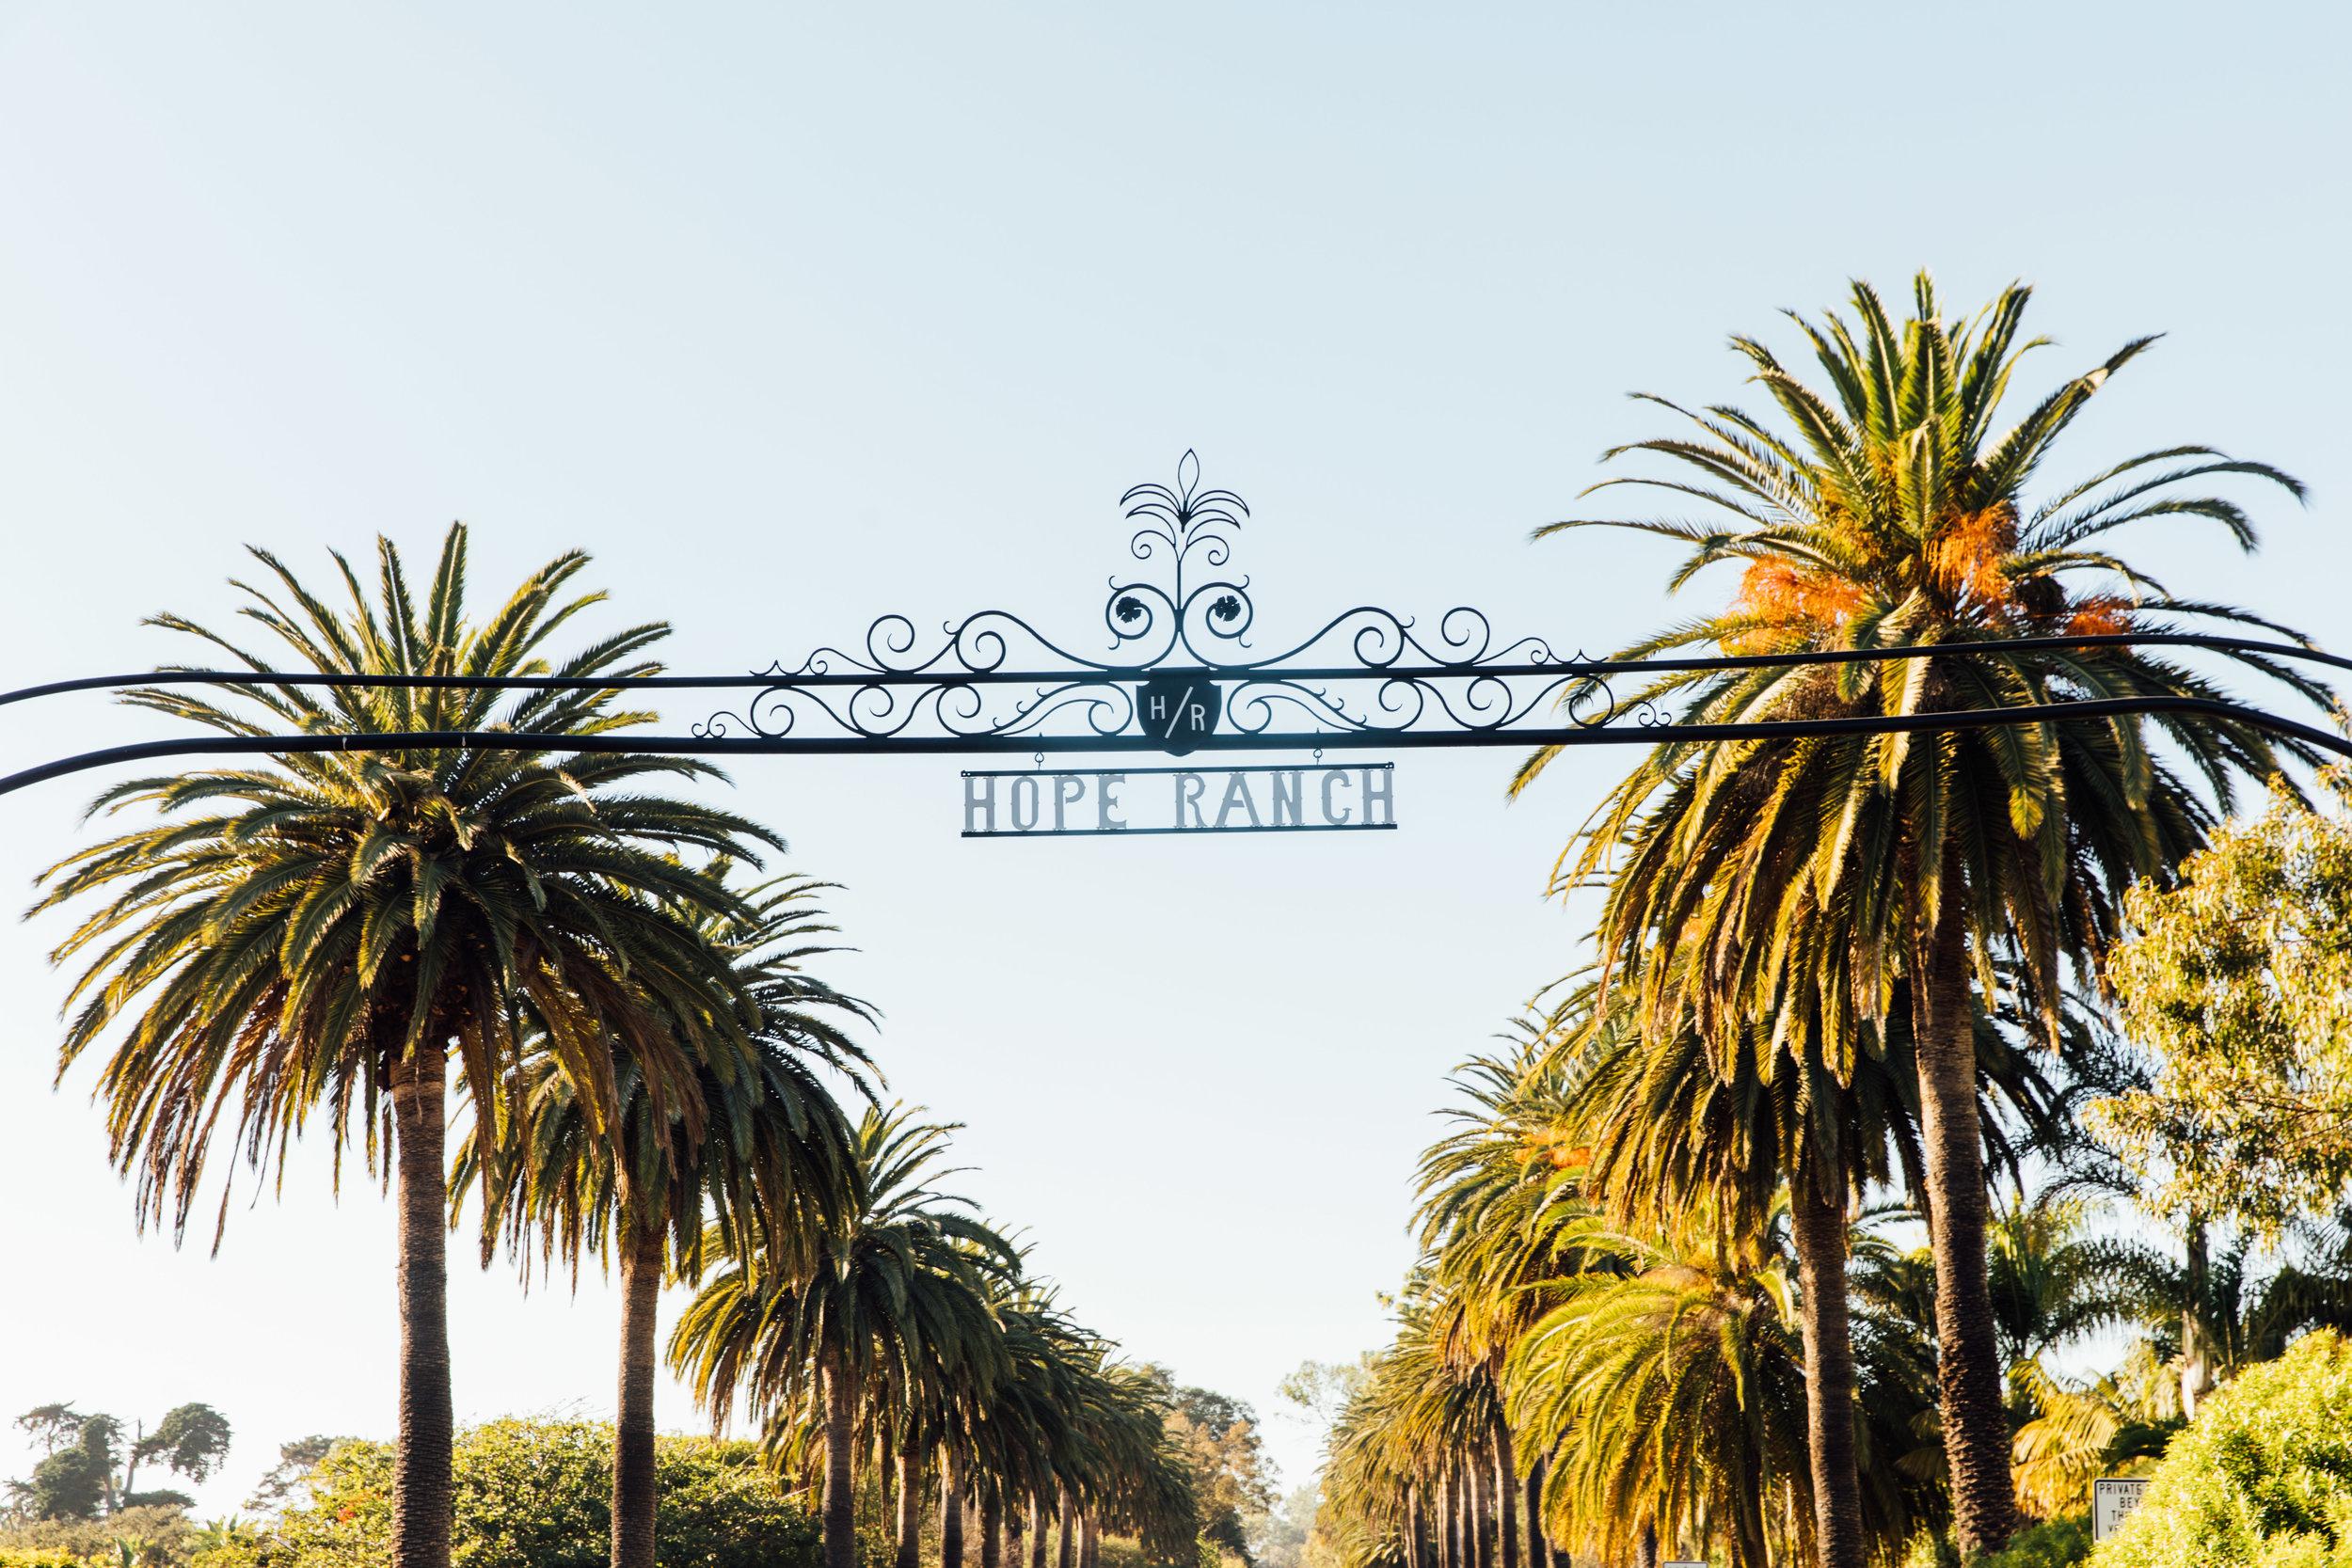 hope-ranch-santa-barbara-travel-lifestyle-real-estate-915.jpg